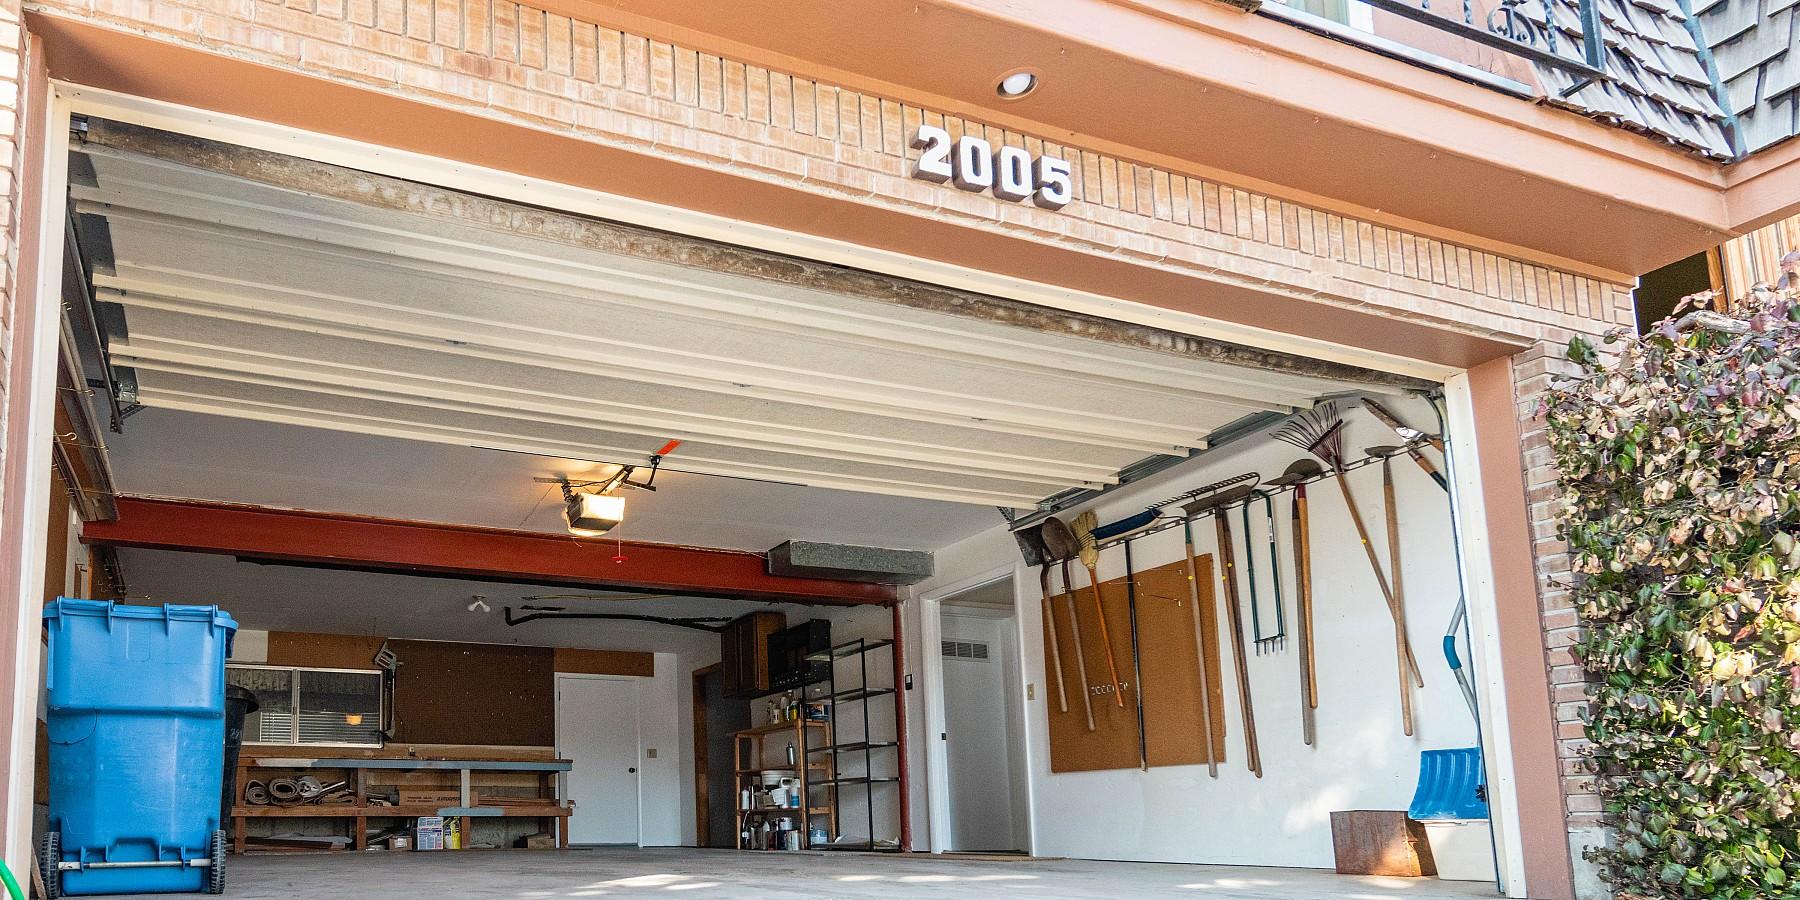 2005 E. Wildwood Drive, Holladay, UT 84121